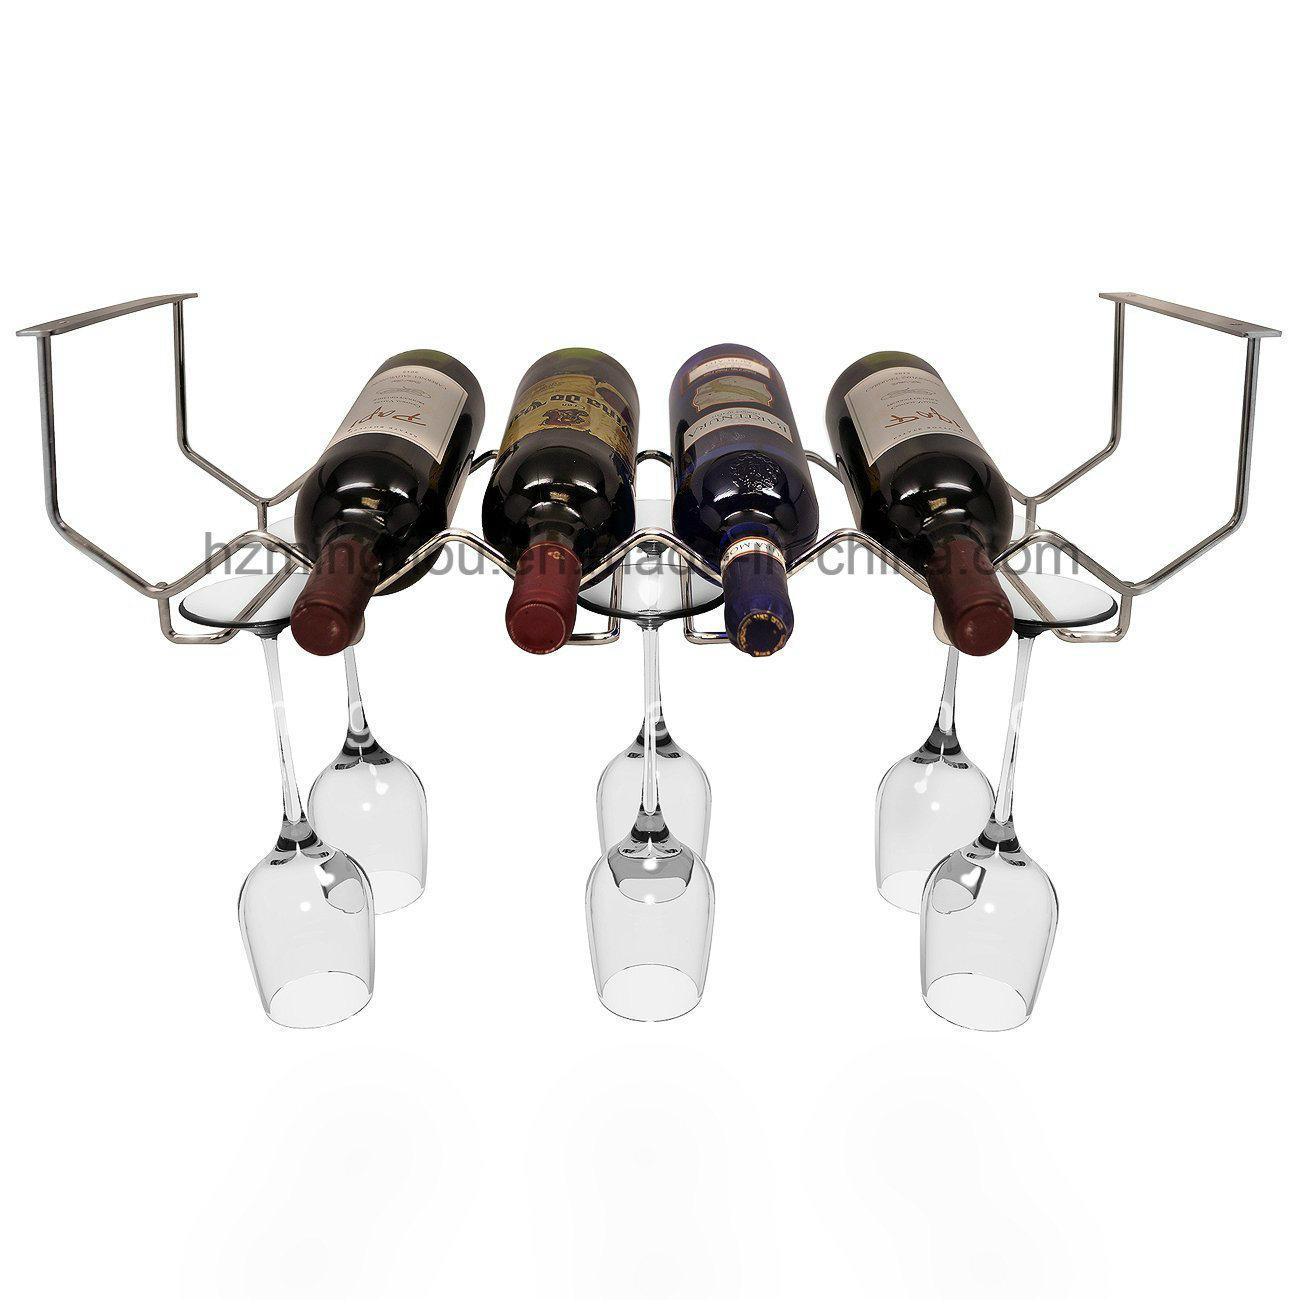 6-Bottles Metal Under Cabinet Wine Bottle Storage Glassware Holder